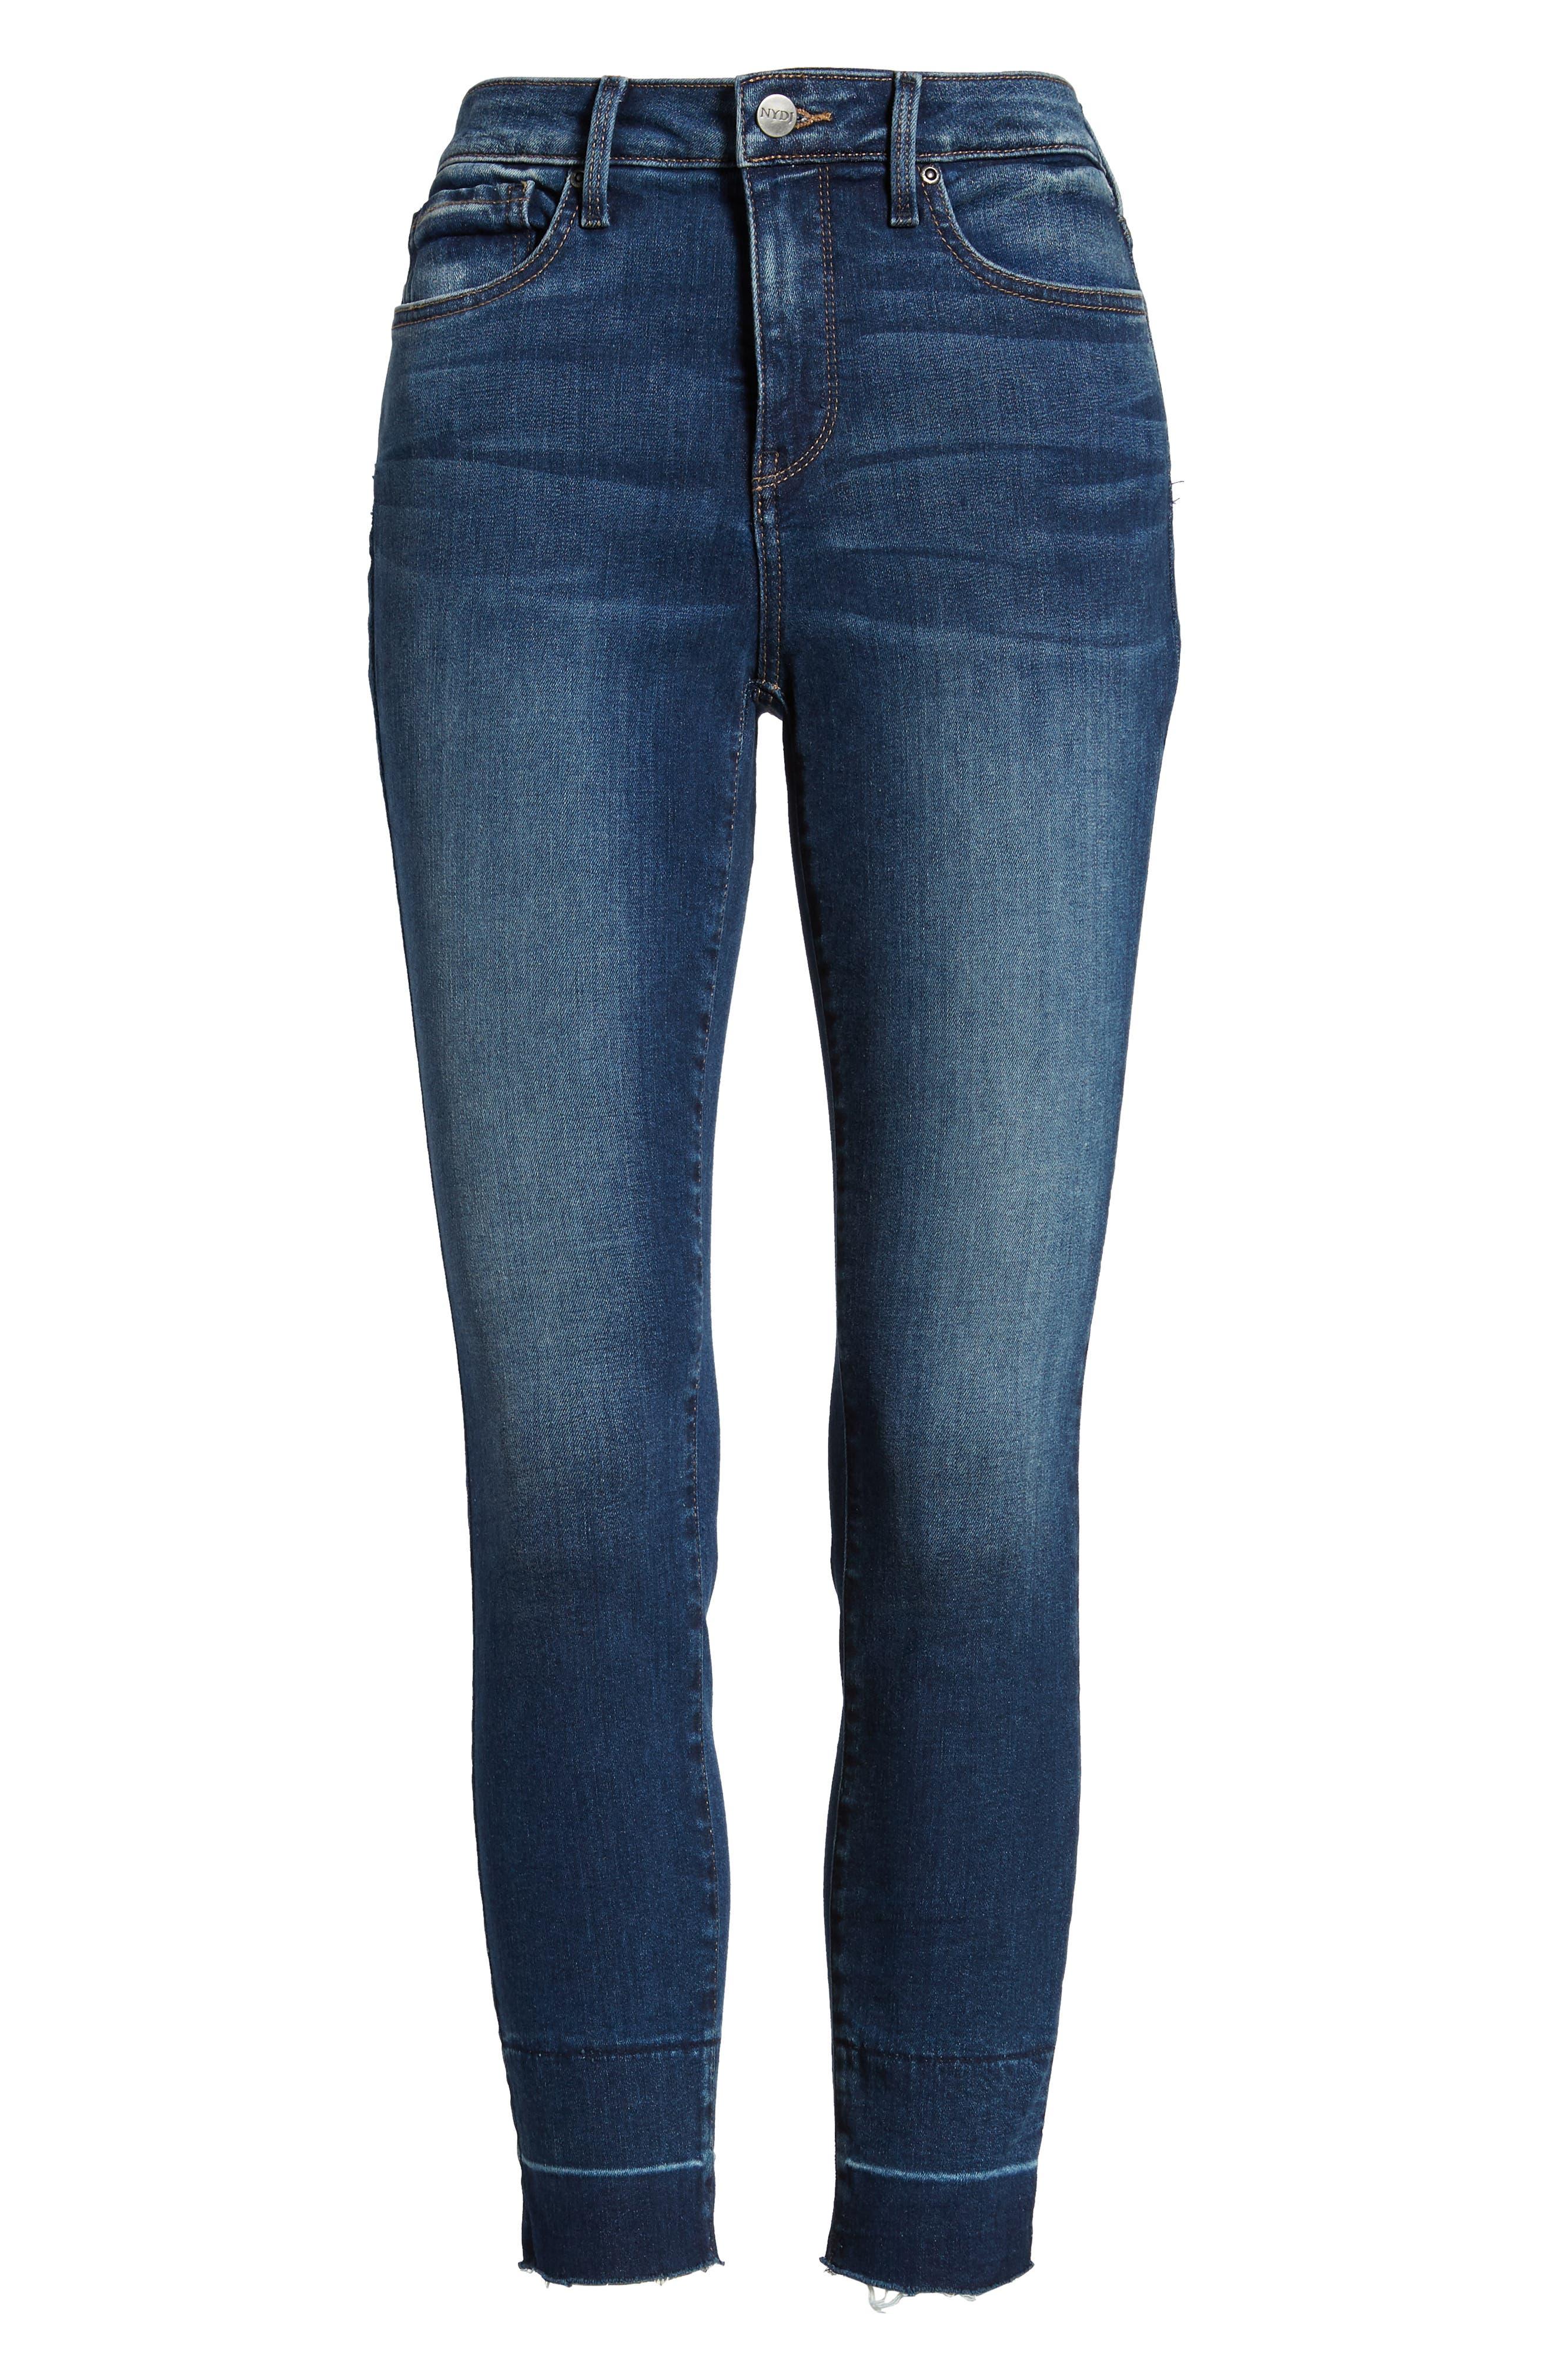 NYDJ,                             Ami Wide Release Hem Super Skinny Jeans,                             Alternate thumbnail 7, color,                             403